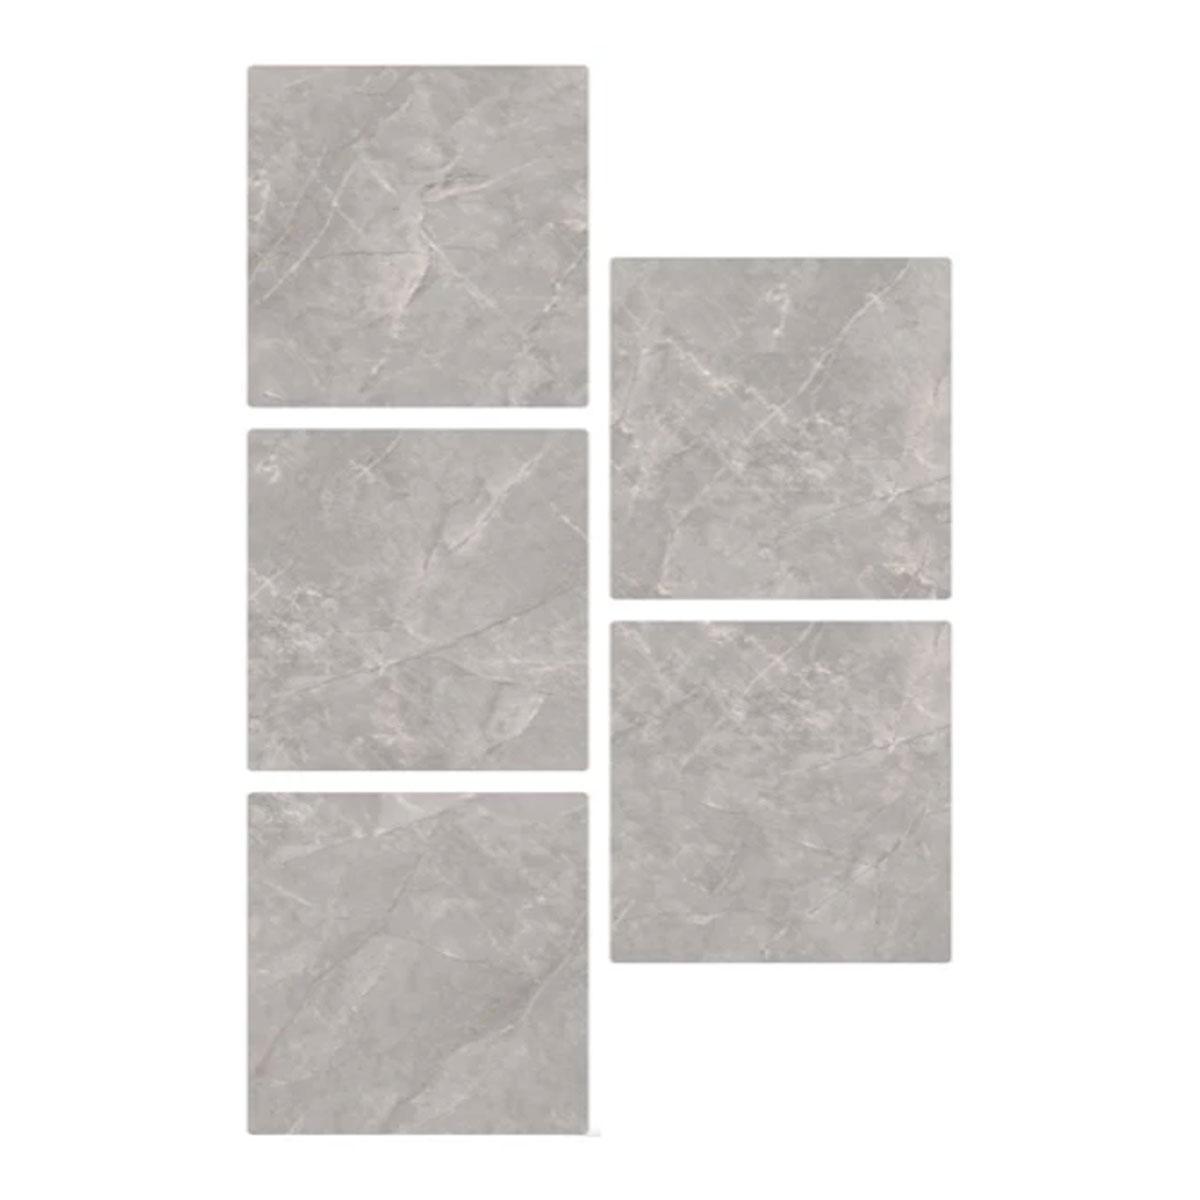 Pavement - Mid Grey - Marble look Tiles - Stone3 Brisbane